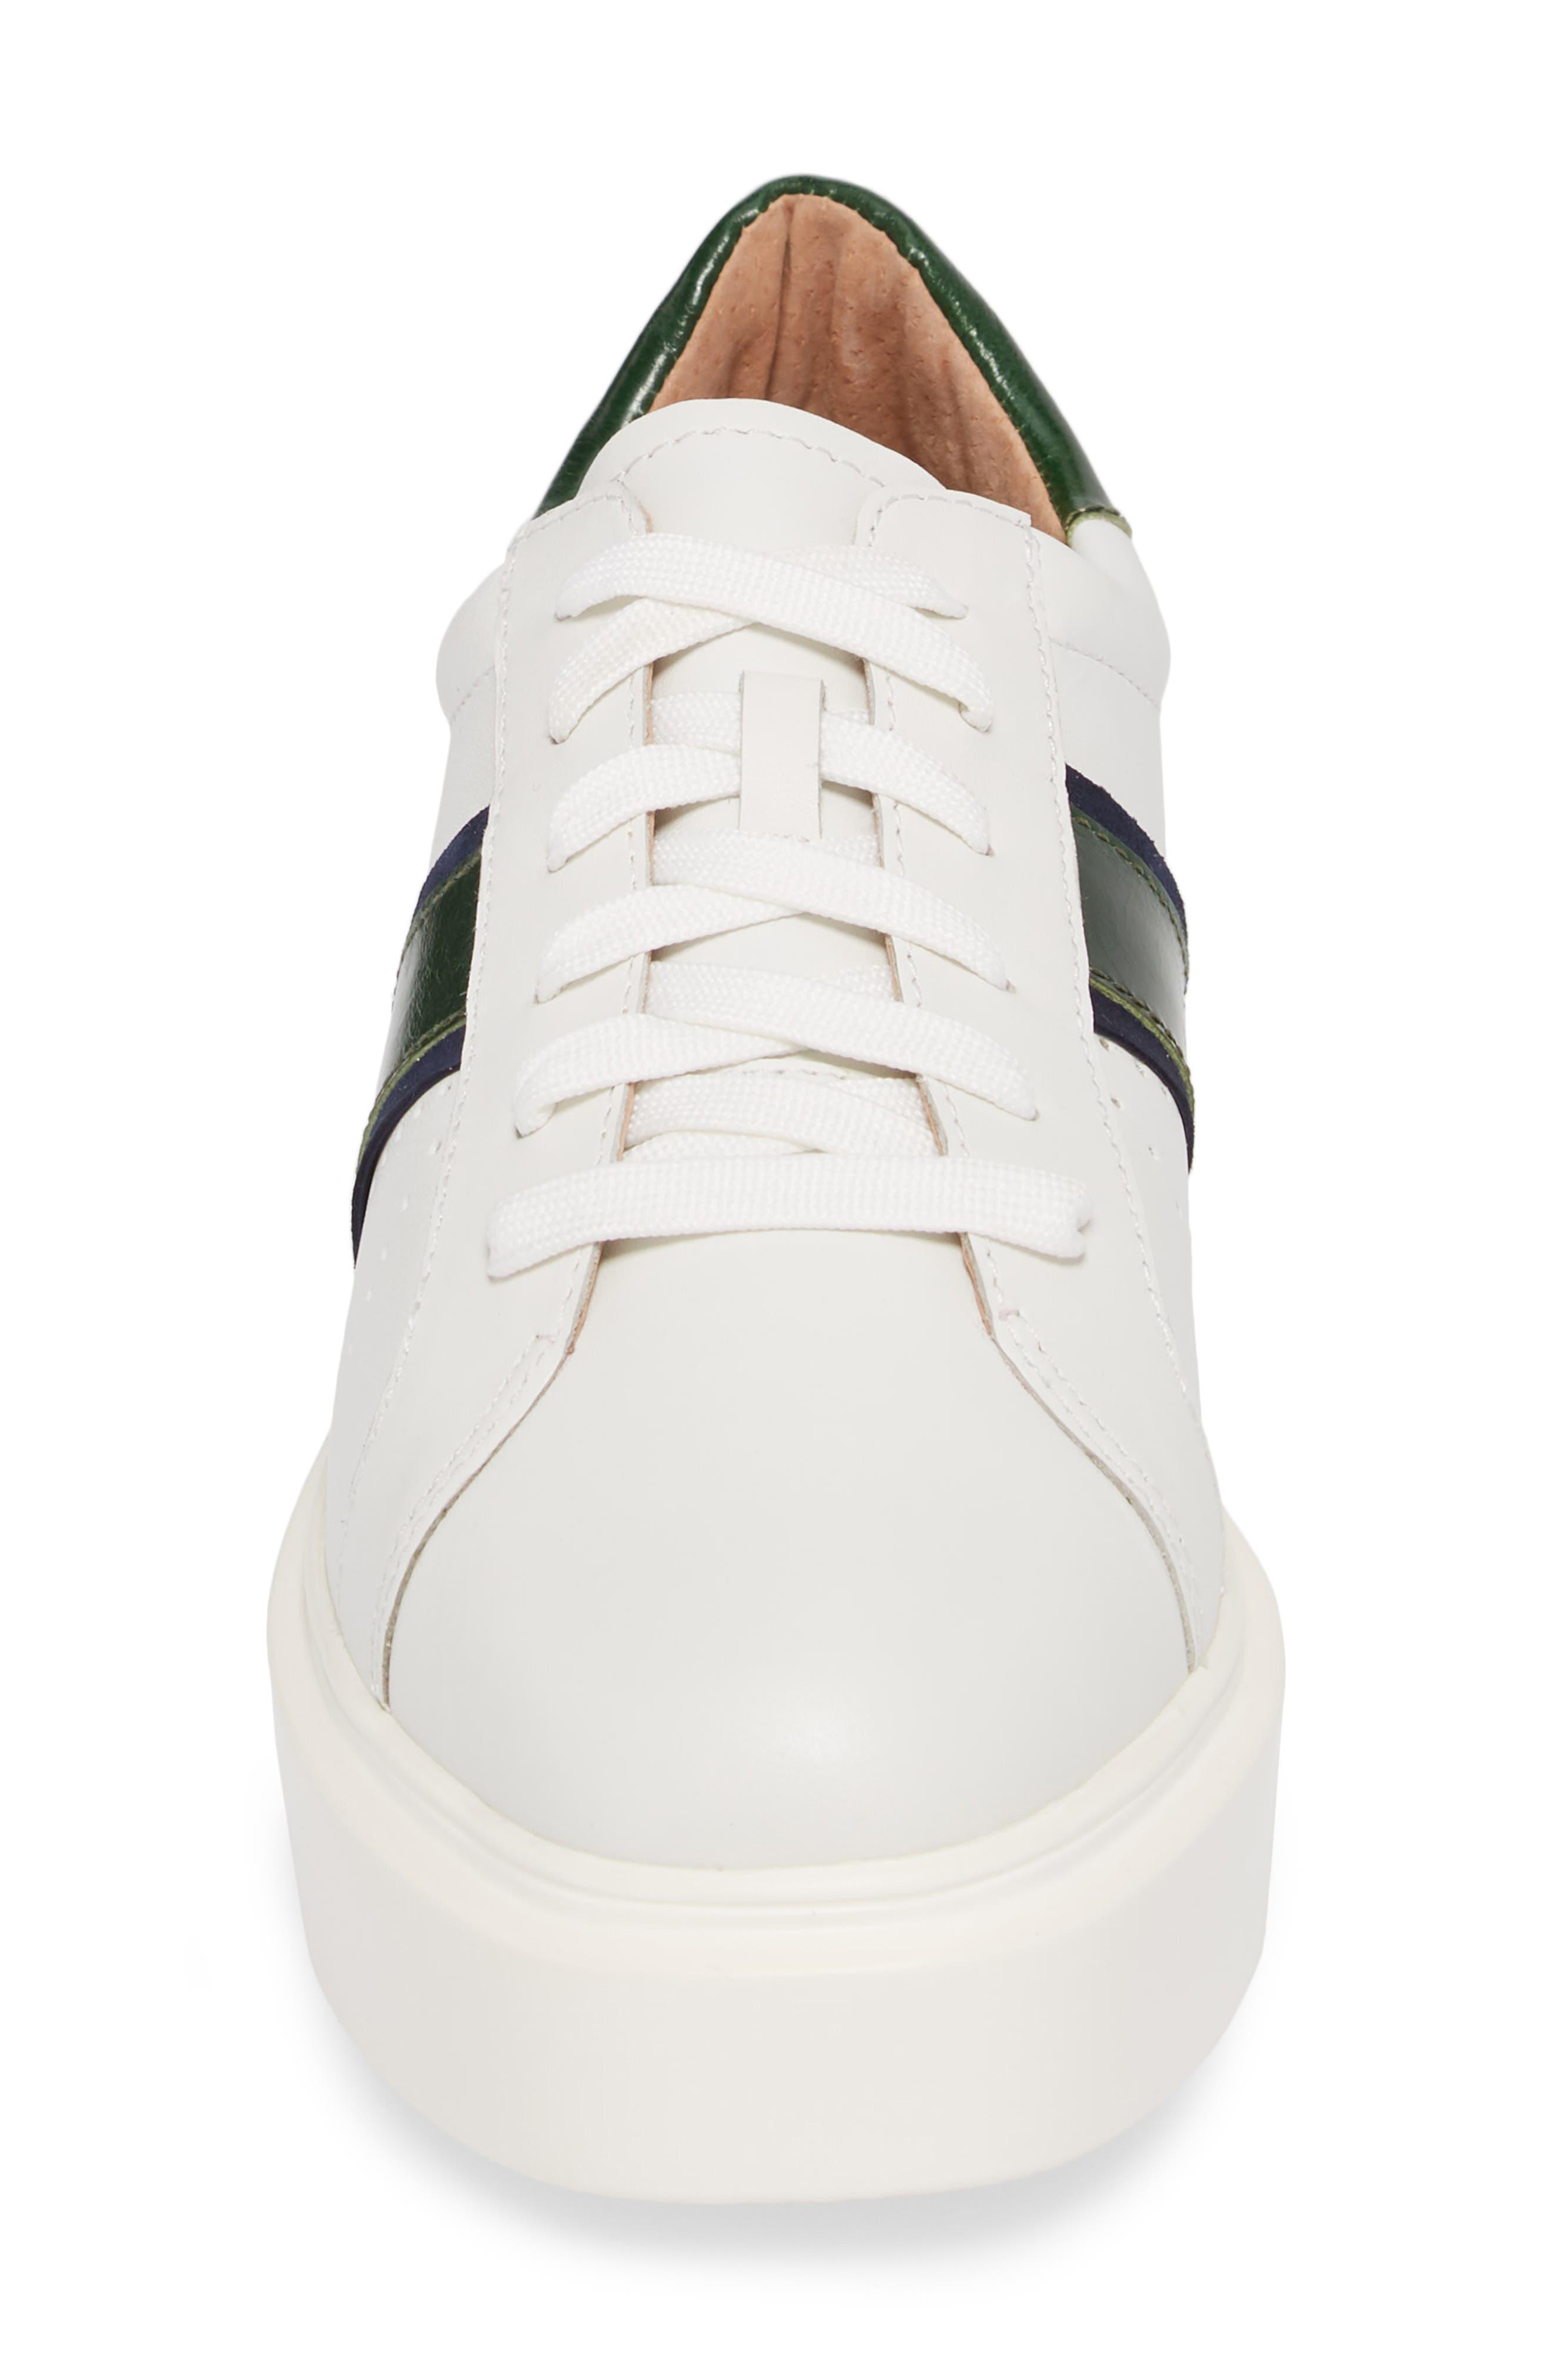 LINEA PAOLO, Knox Platform Sneaker, Alternate thumbnail 4, color, WHITE LEATHER